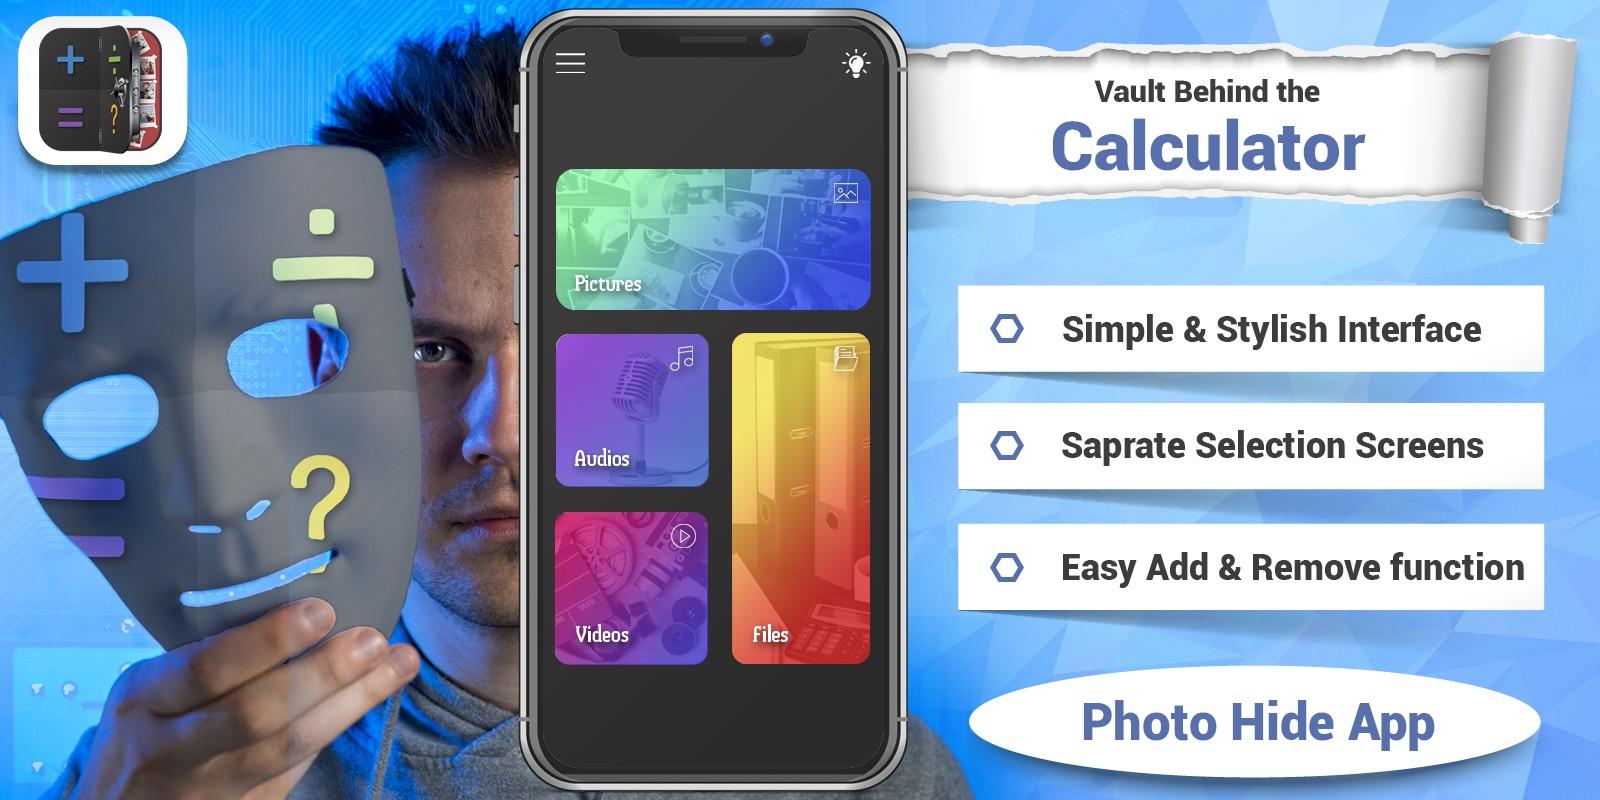 Calculator Vault  - Android Source Code